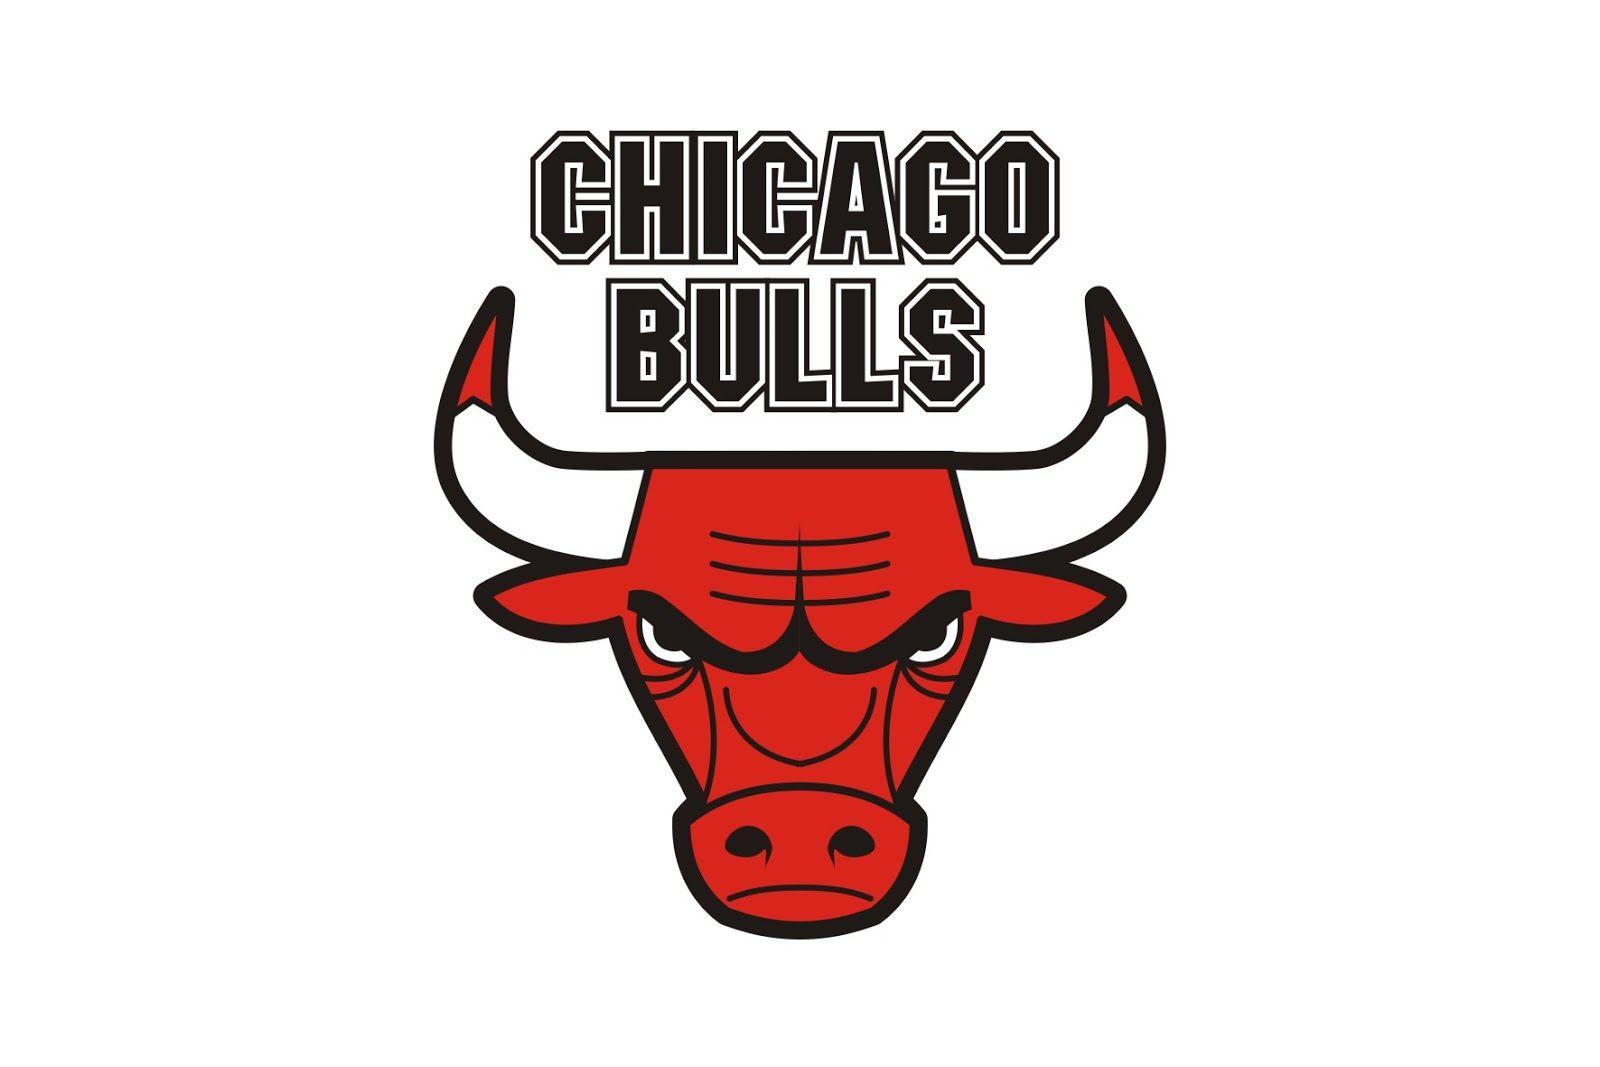 chicago bulls logo hd desktop backgrounds 13822 - hd wallpapers site